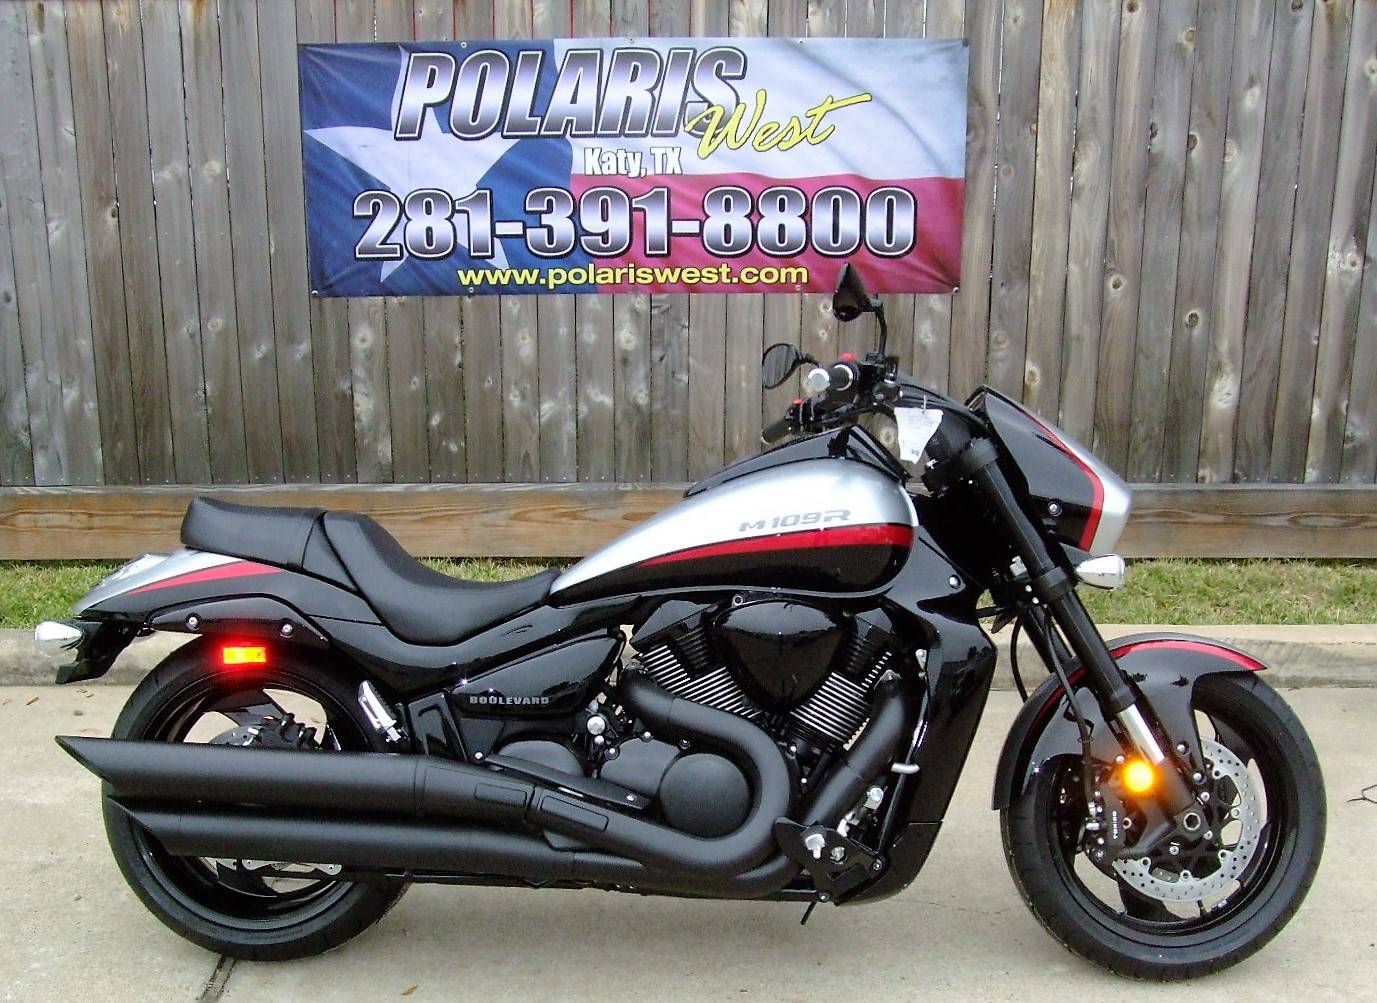 New 2018 Suzuki Boulevard M109R B.O.S.S. Motorcycles in Katy, TX ...